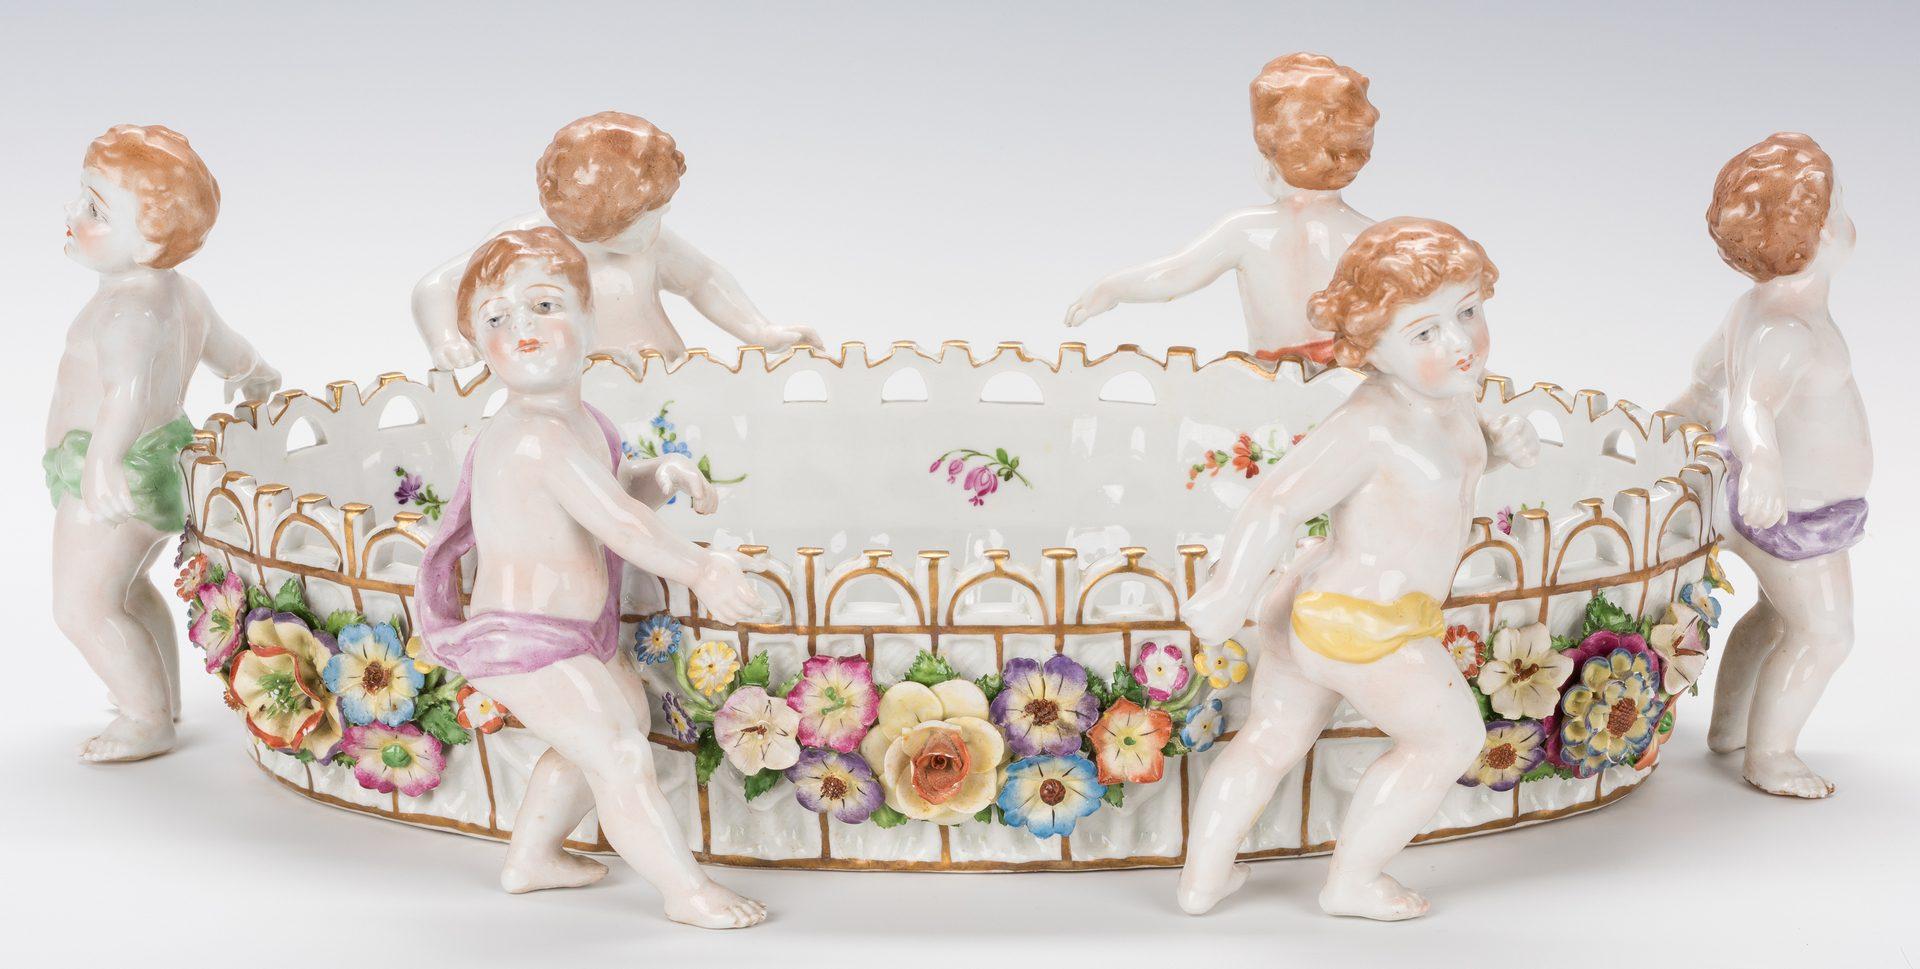 Lot 749: German Porcelain Figural Putti Jardiniere